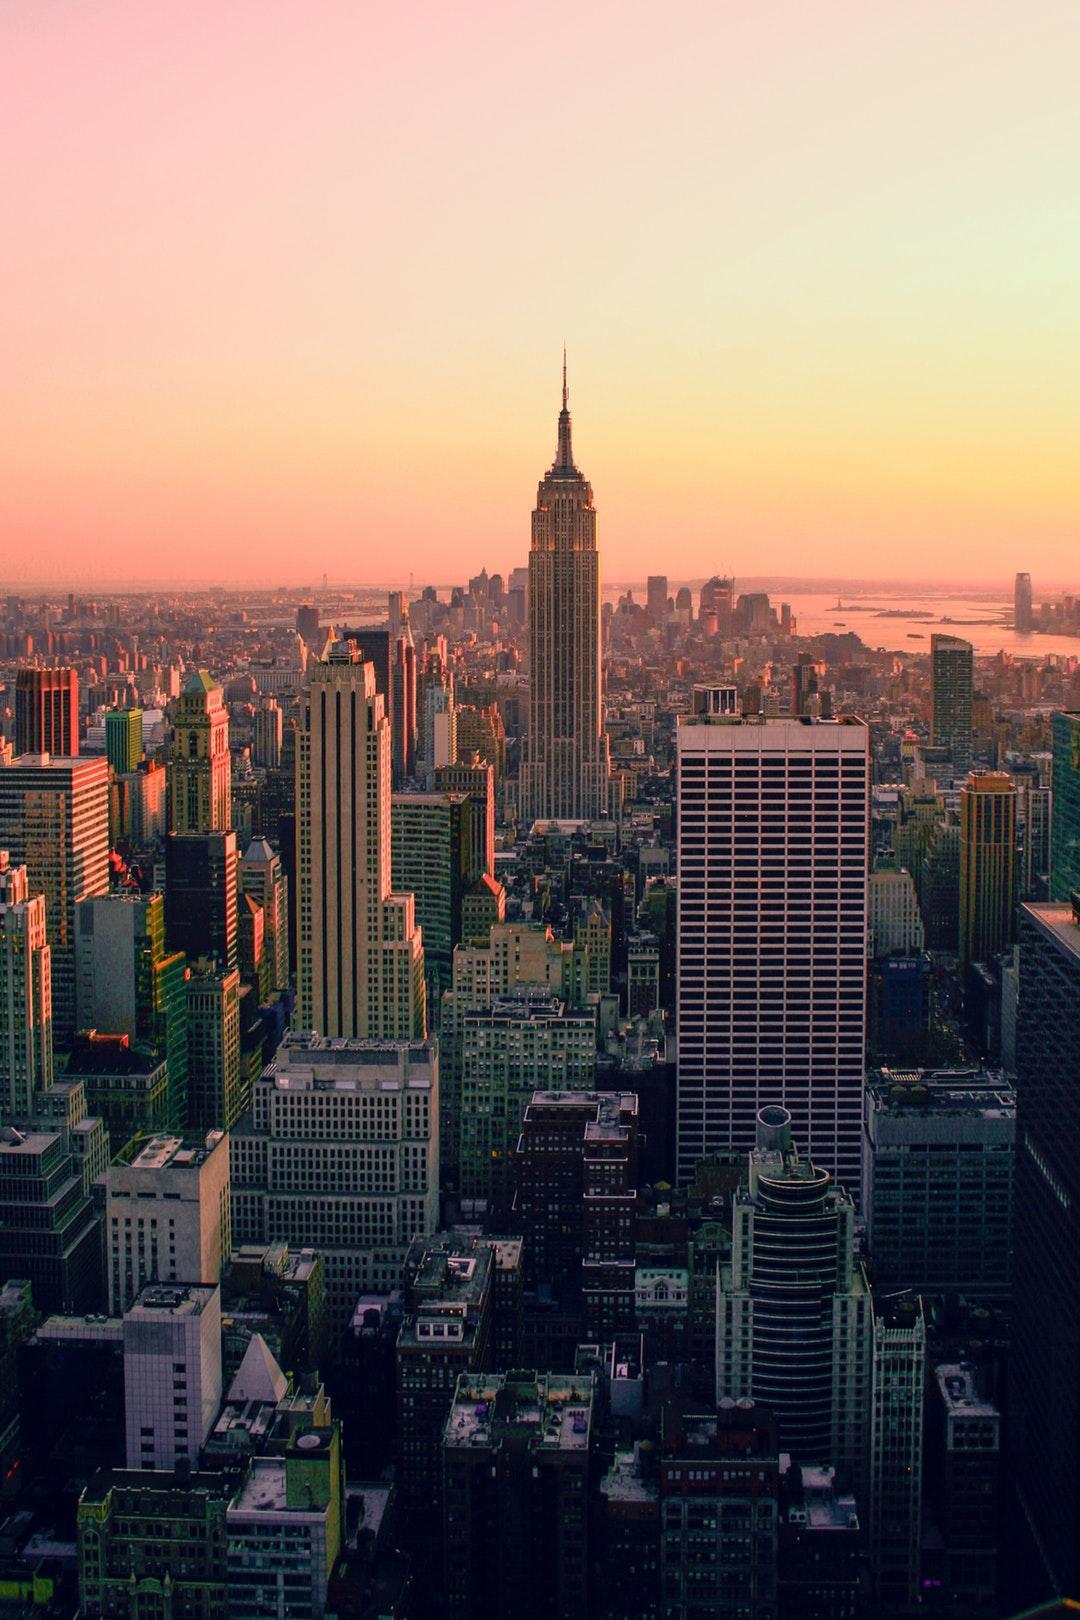 Download 1920x1080 wallpaper new york, dark, night, city